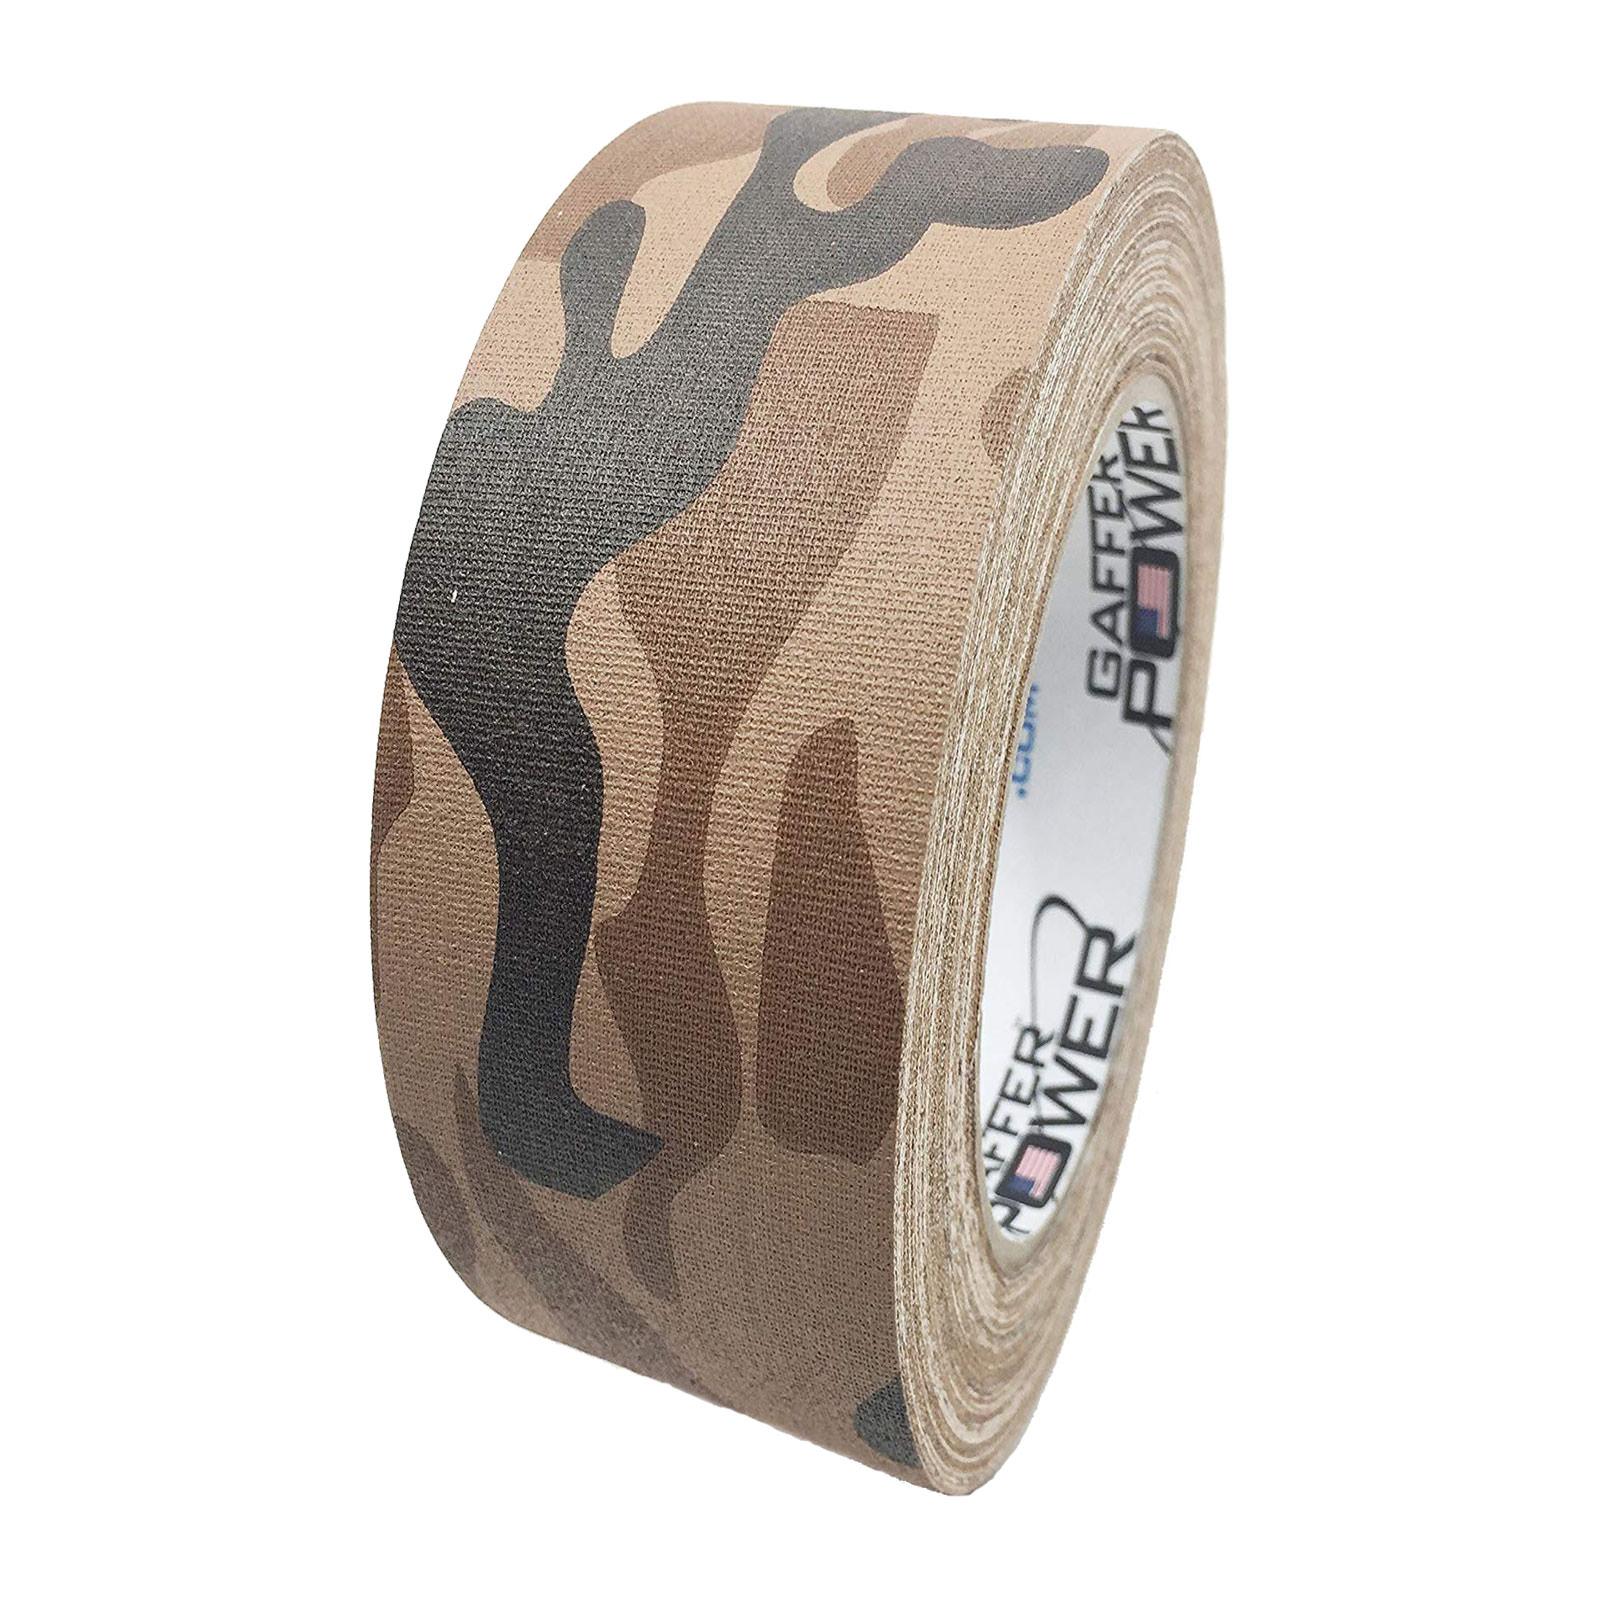 Camouflage Gaffer Tape